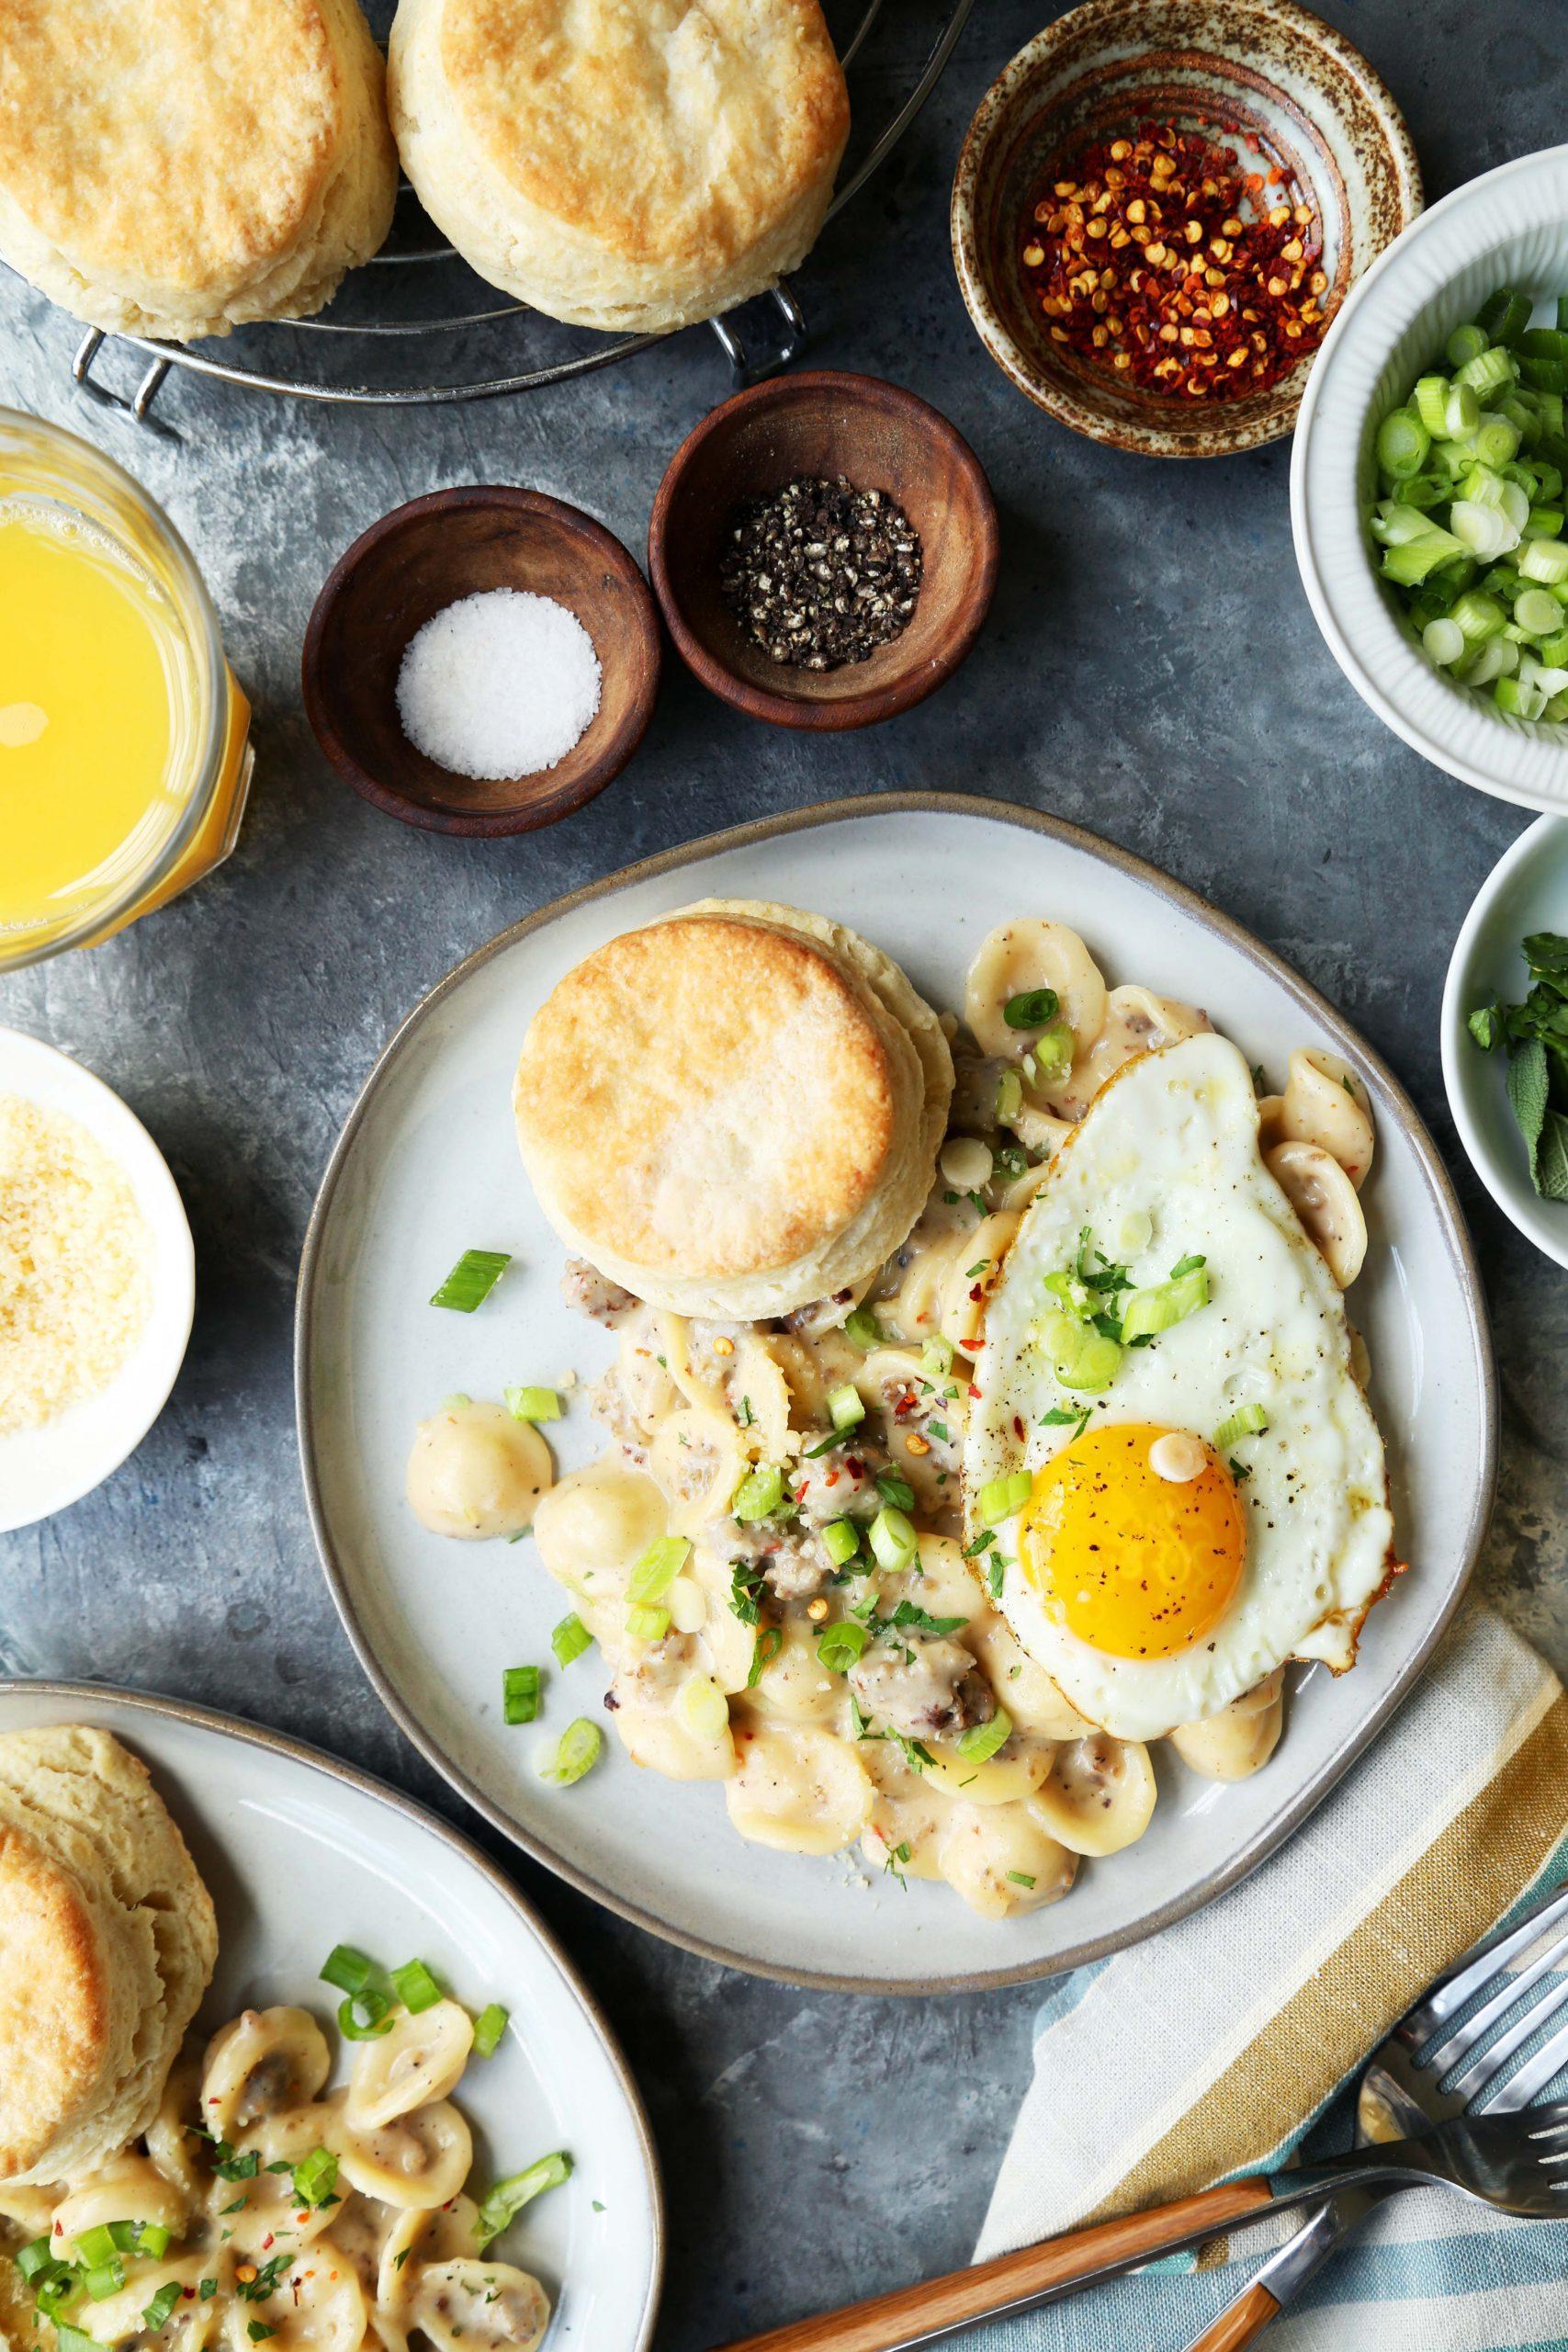 Biscuit and Sausage Gravy Breakfast Pasta